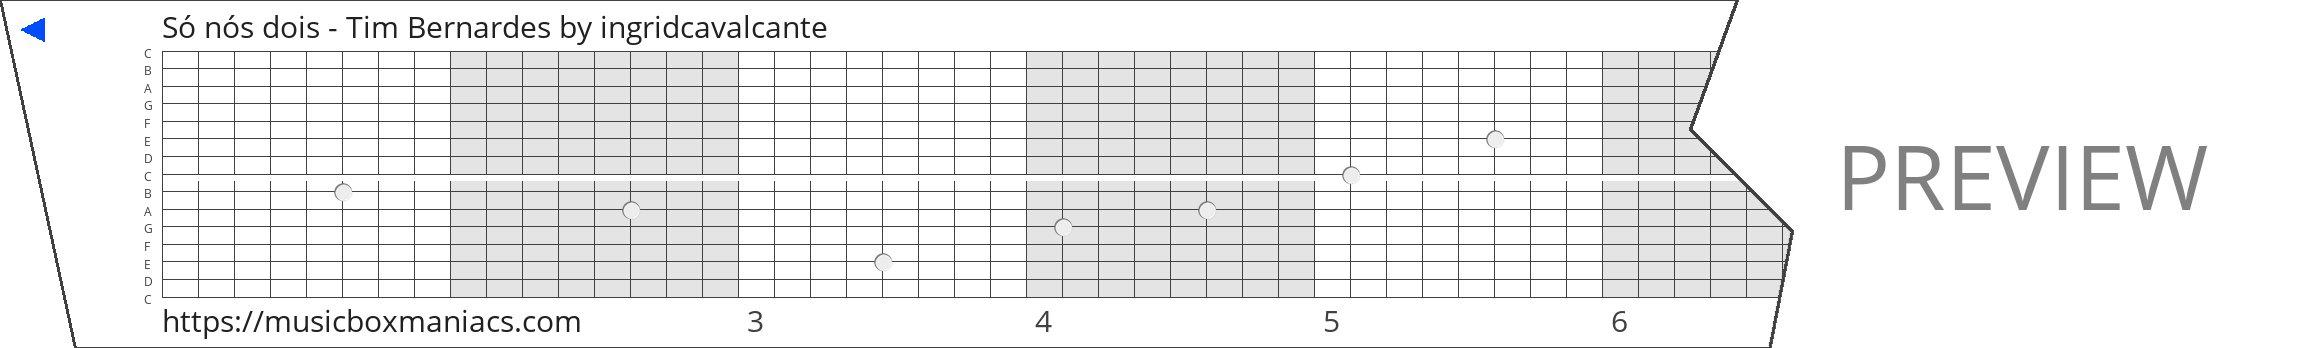 Só nós dois - Tim Bernardes 15 note music box paper strip